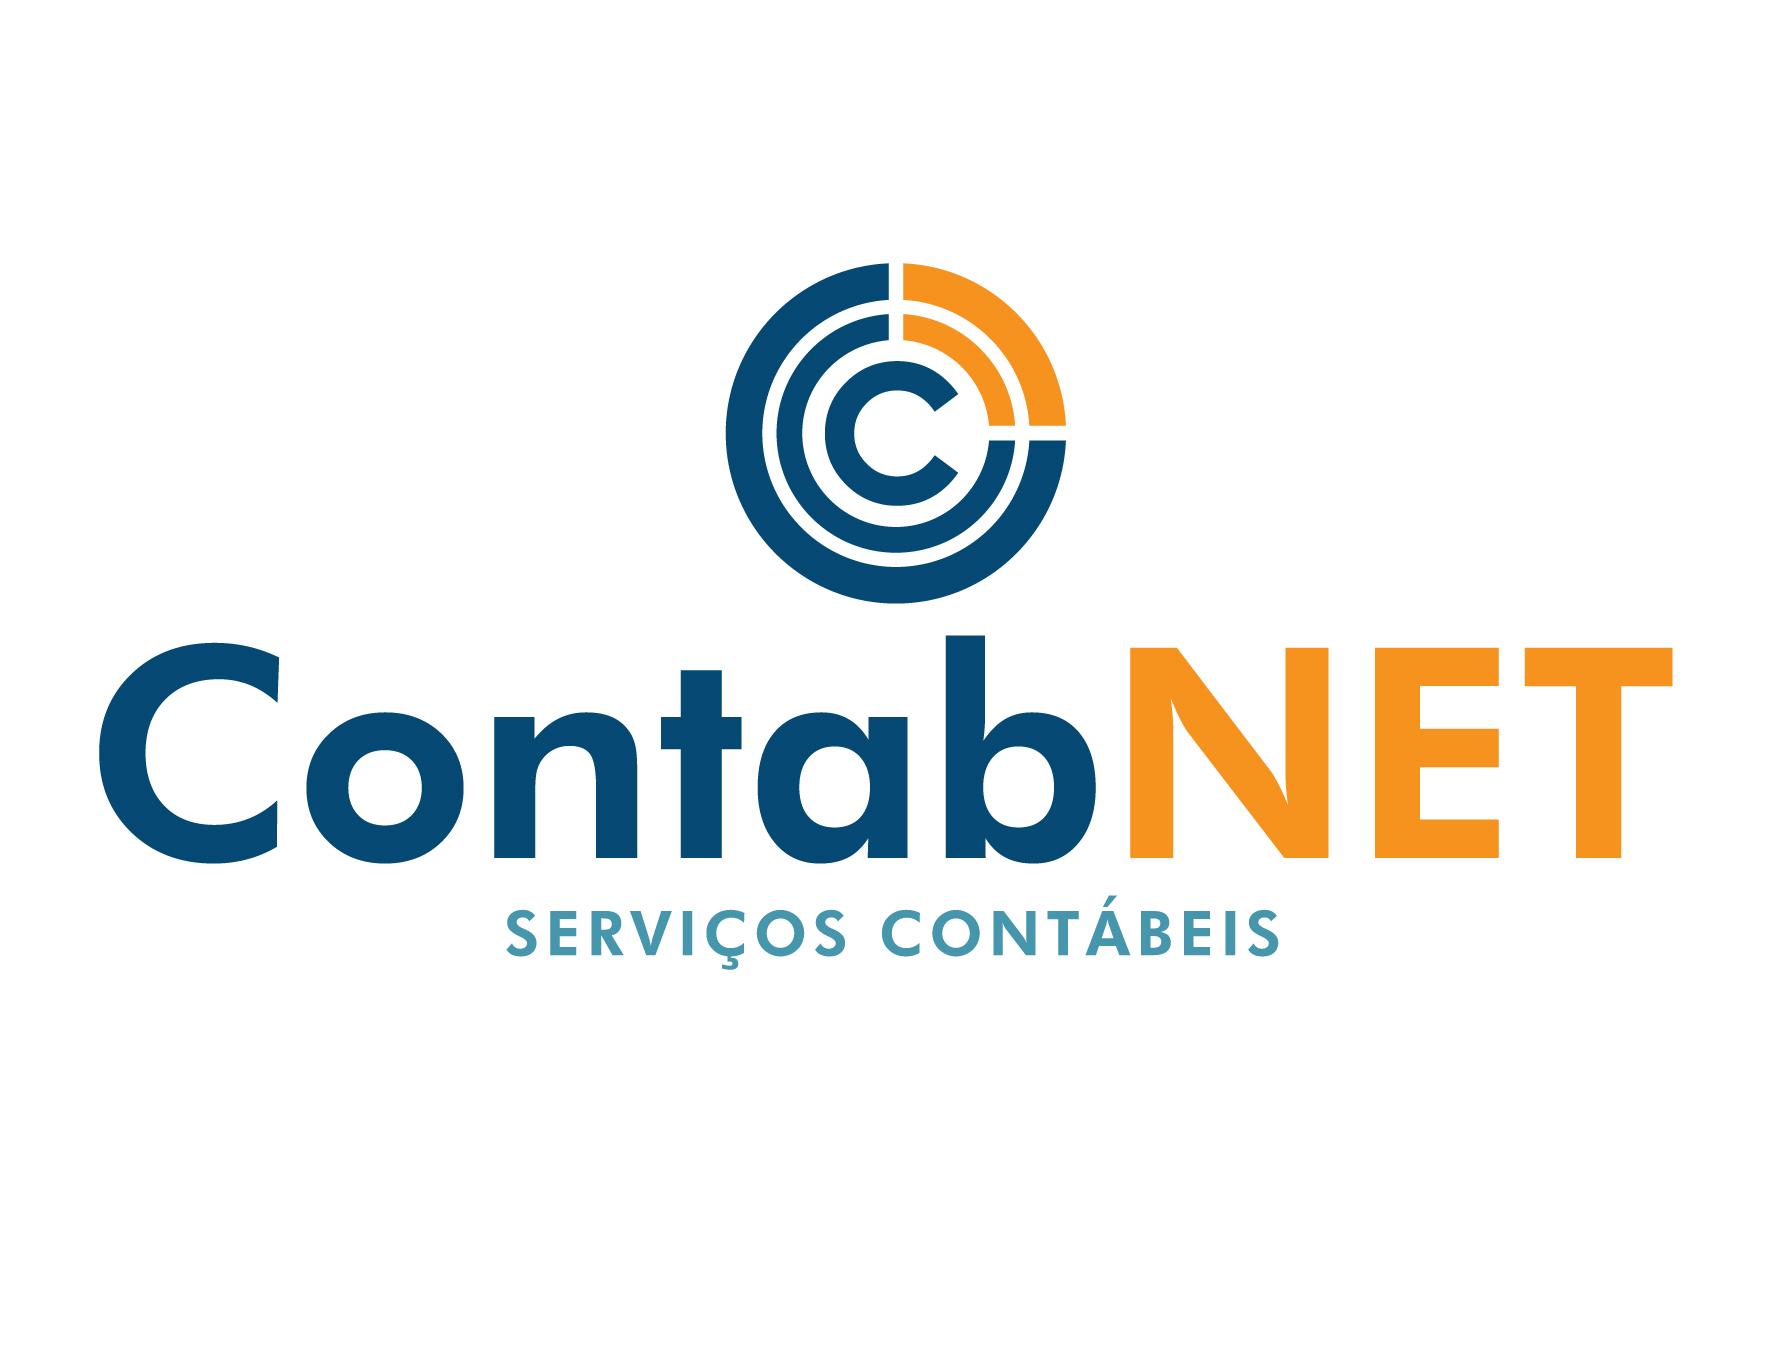 CONTABNET-01